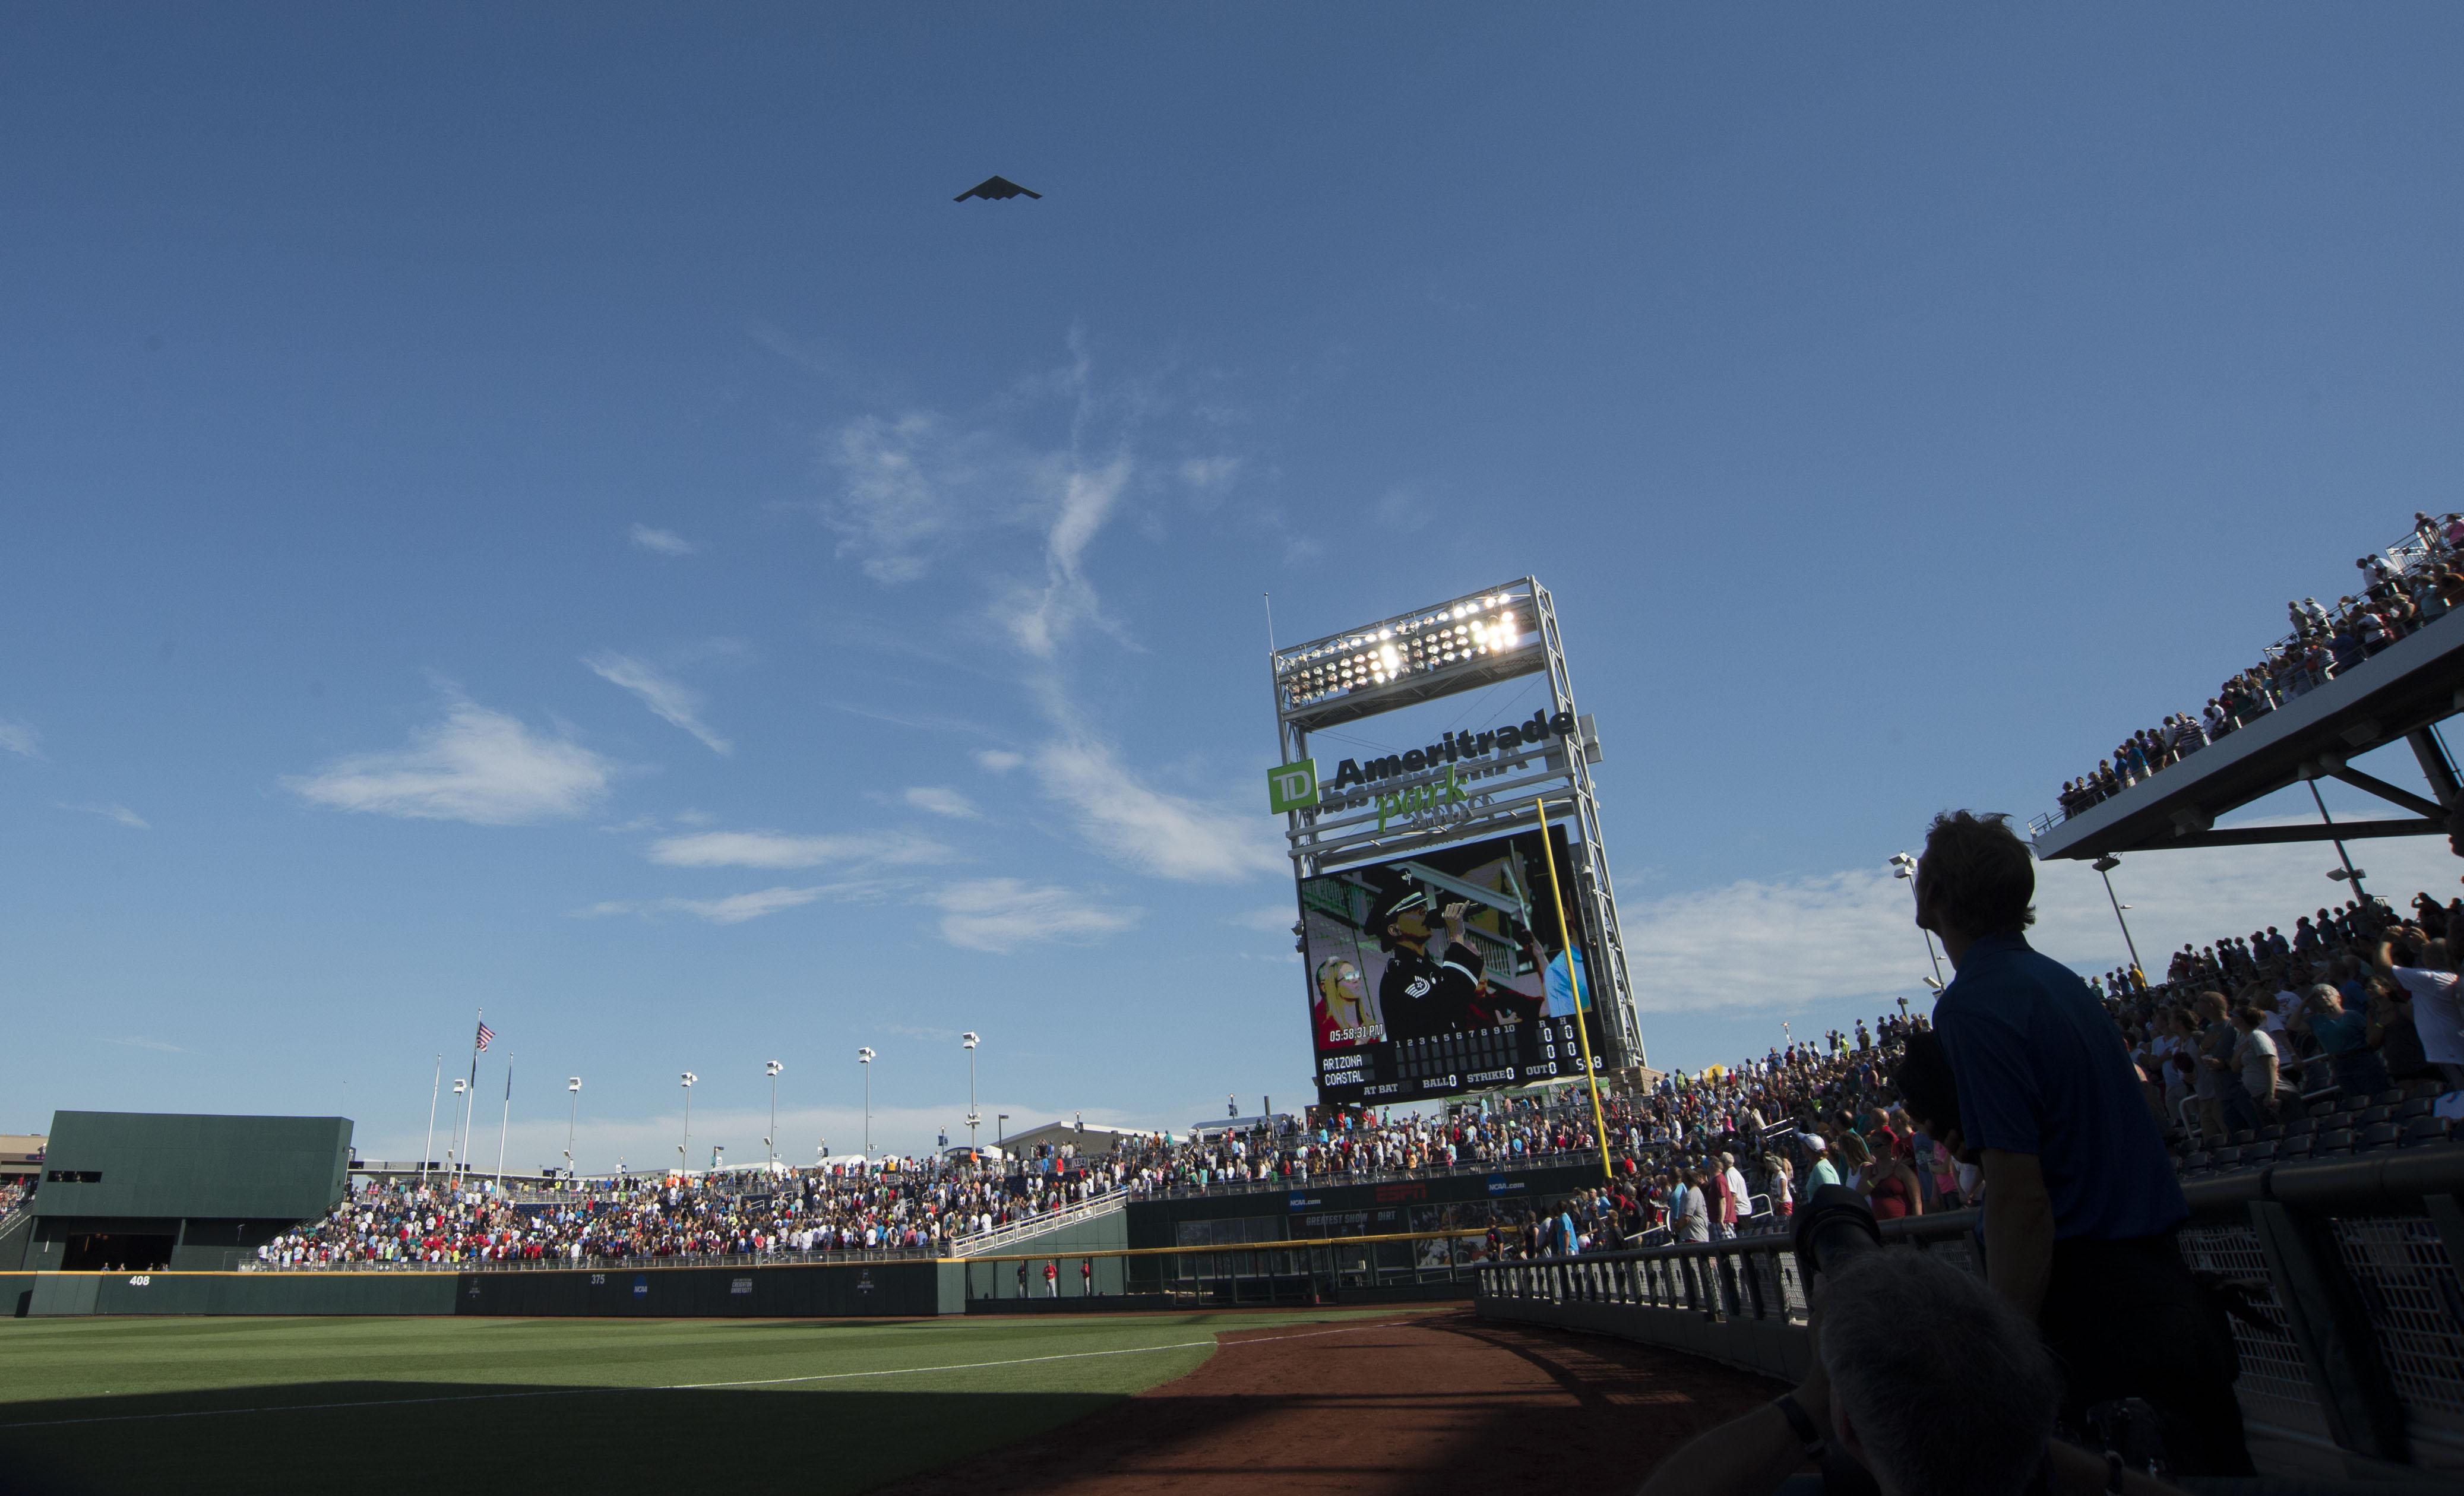 9358611-ncaa-baseball-college-world-series-arizona-vs-coastal-carolina